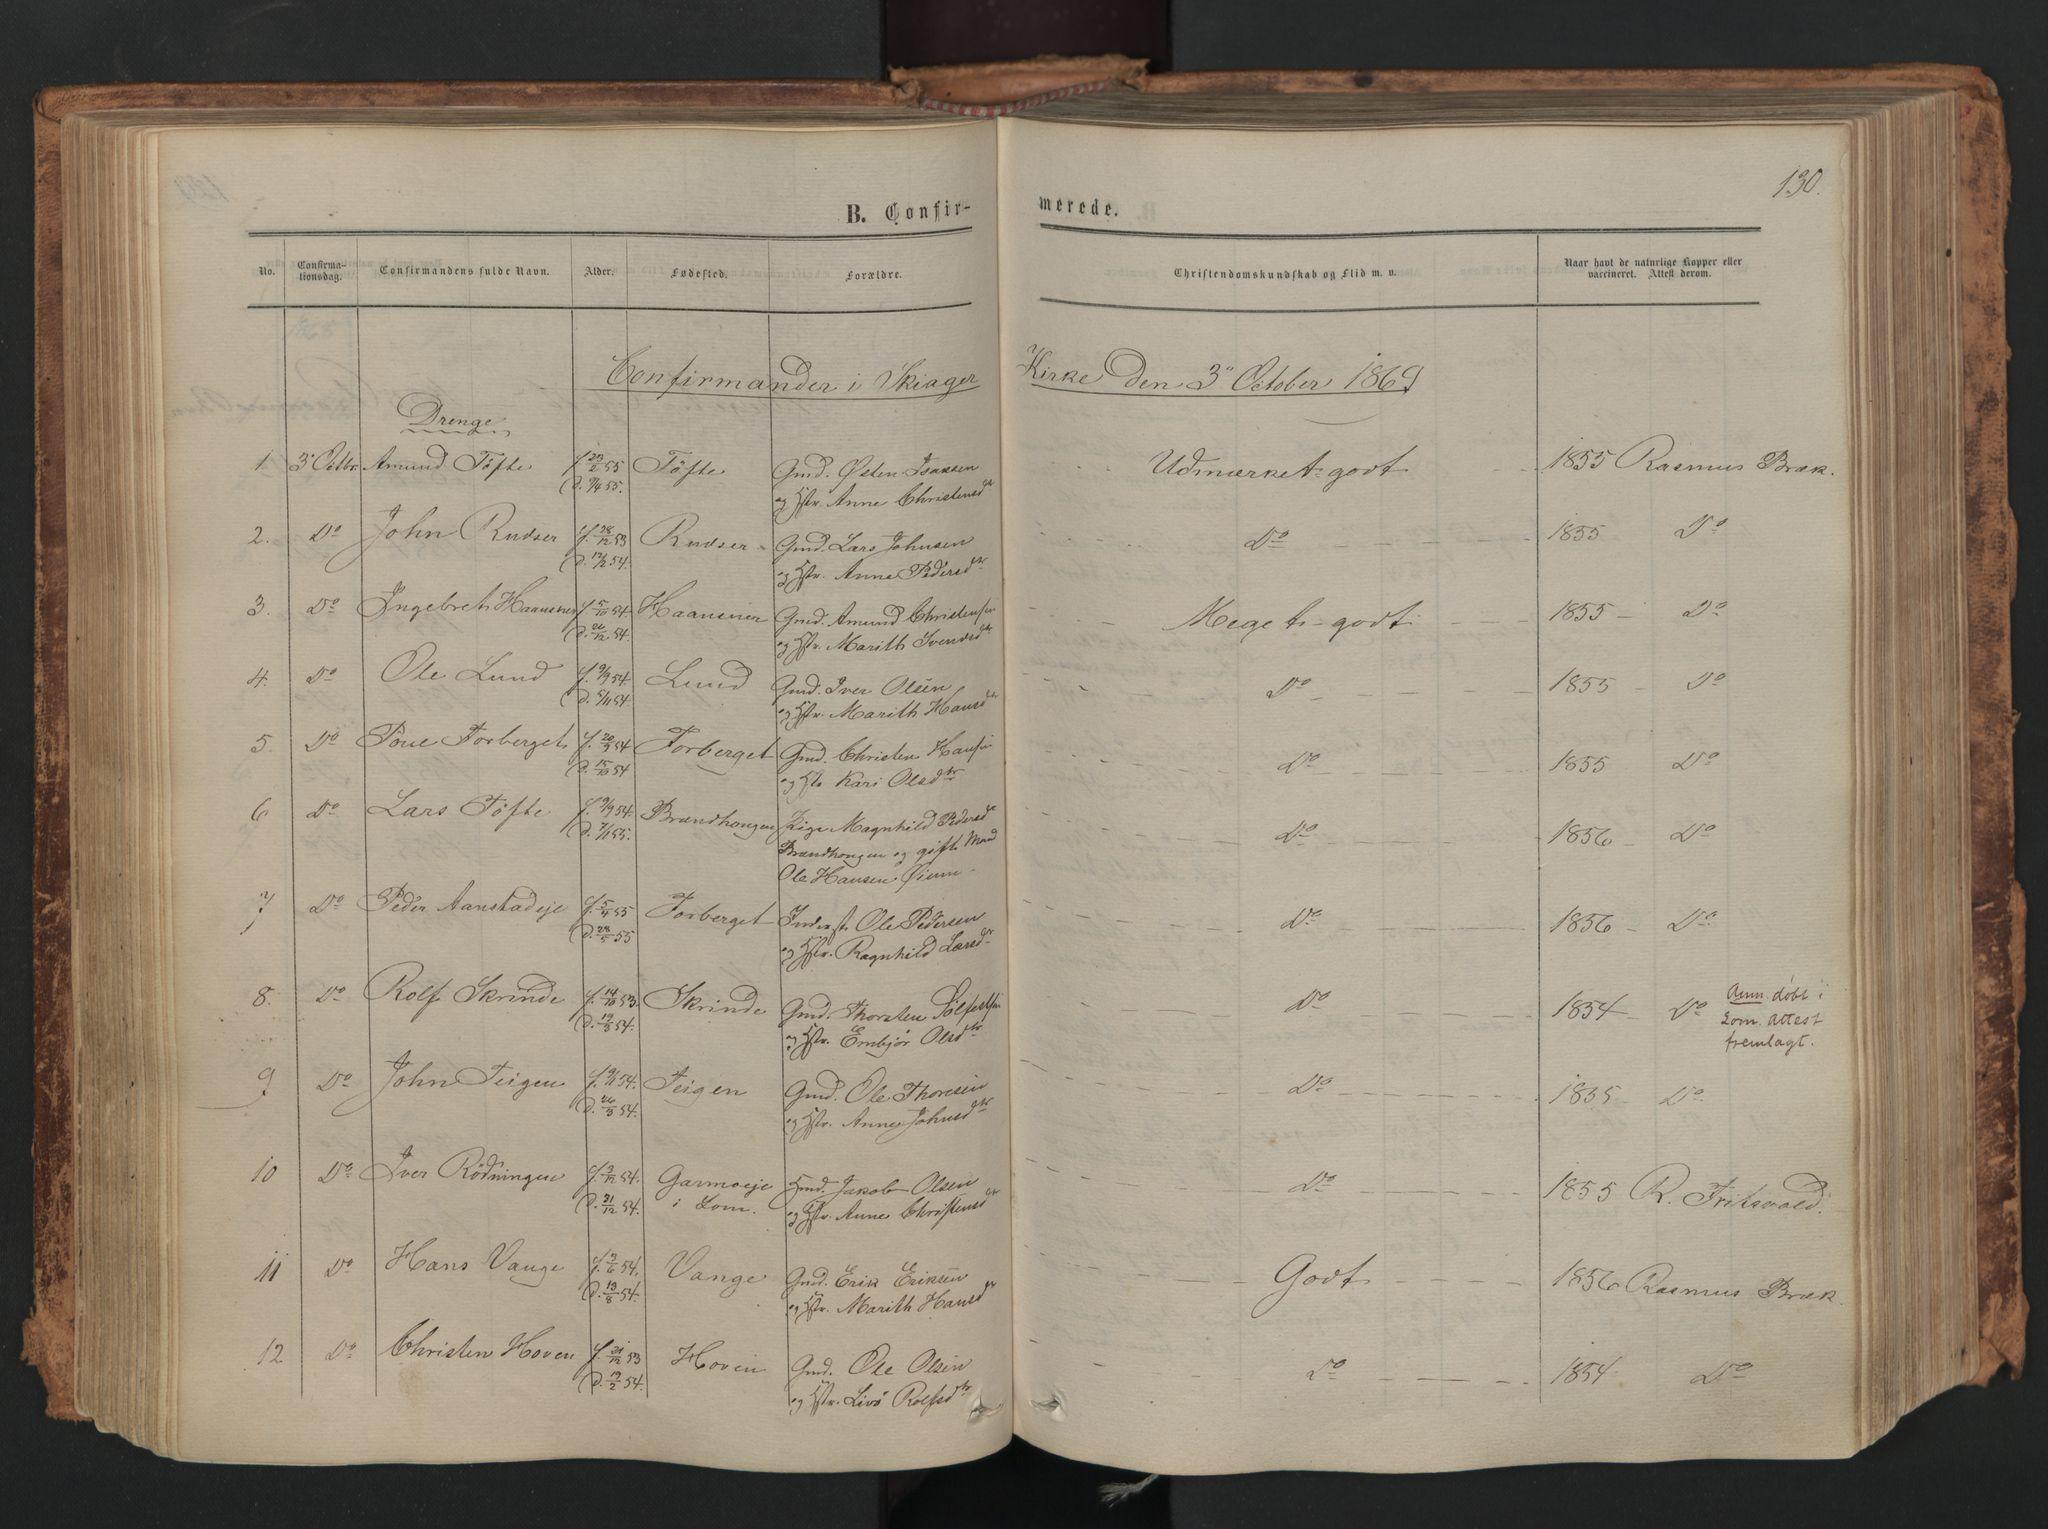 SAH, Skjåk prestekontor, Ministerialbok nr. 1, 1863-1879, s. 130